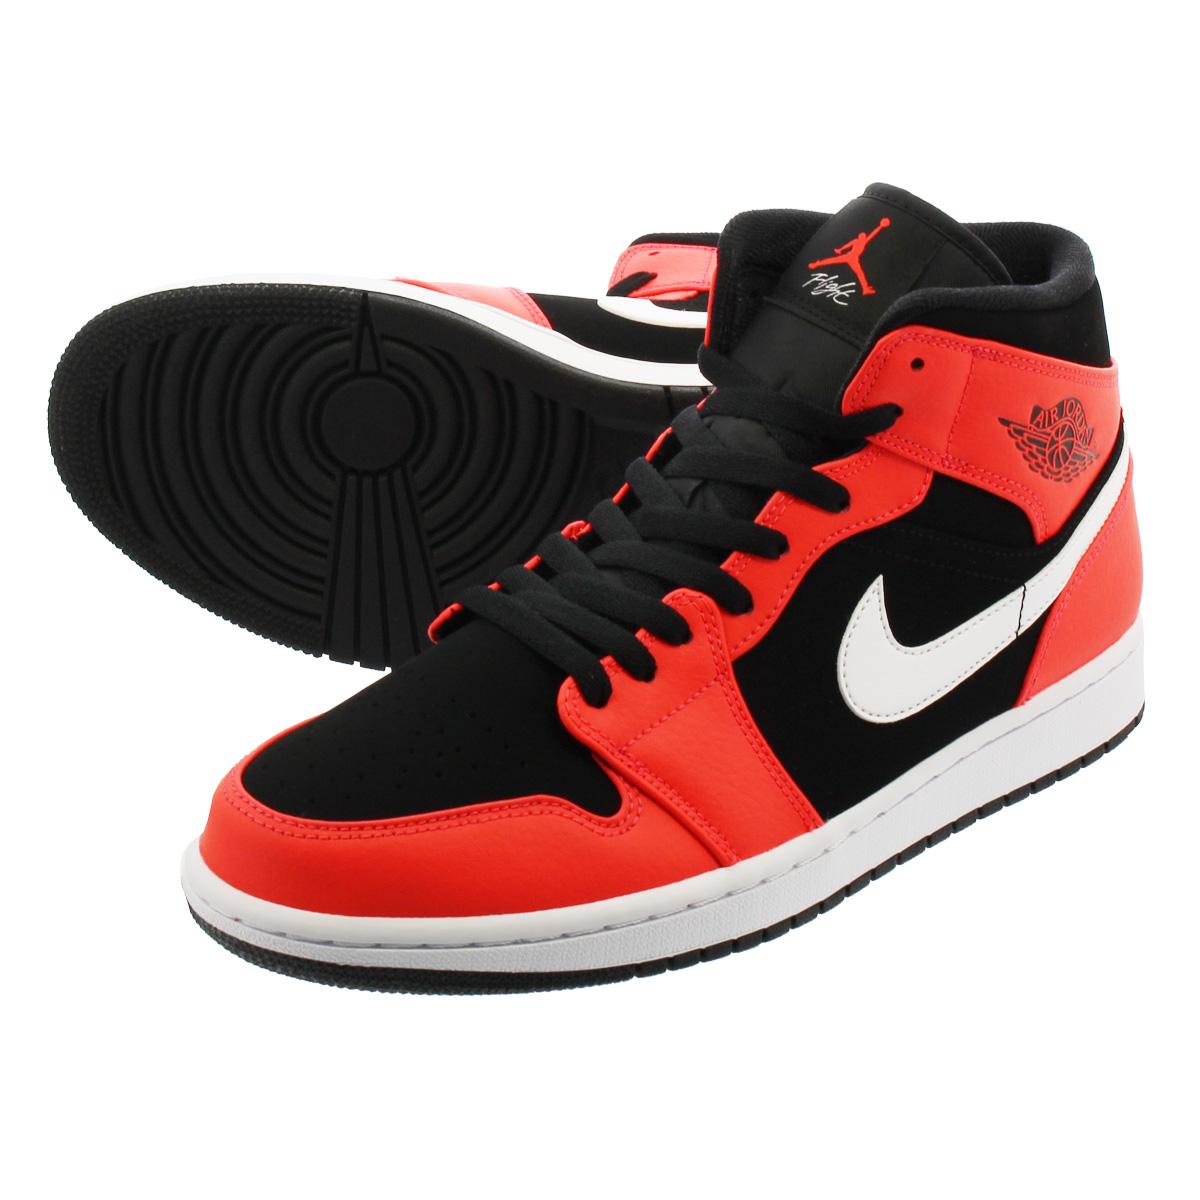 99bd2ae00dc NIKE AIR JORDAN 1 MID Nike Air Jordan 1 mid BLACK INFRARED 23 WHITE  554